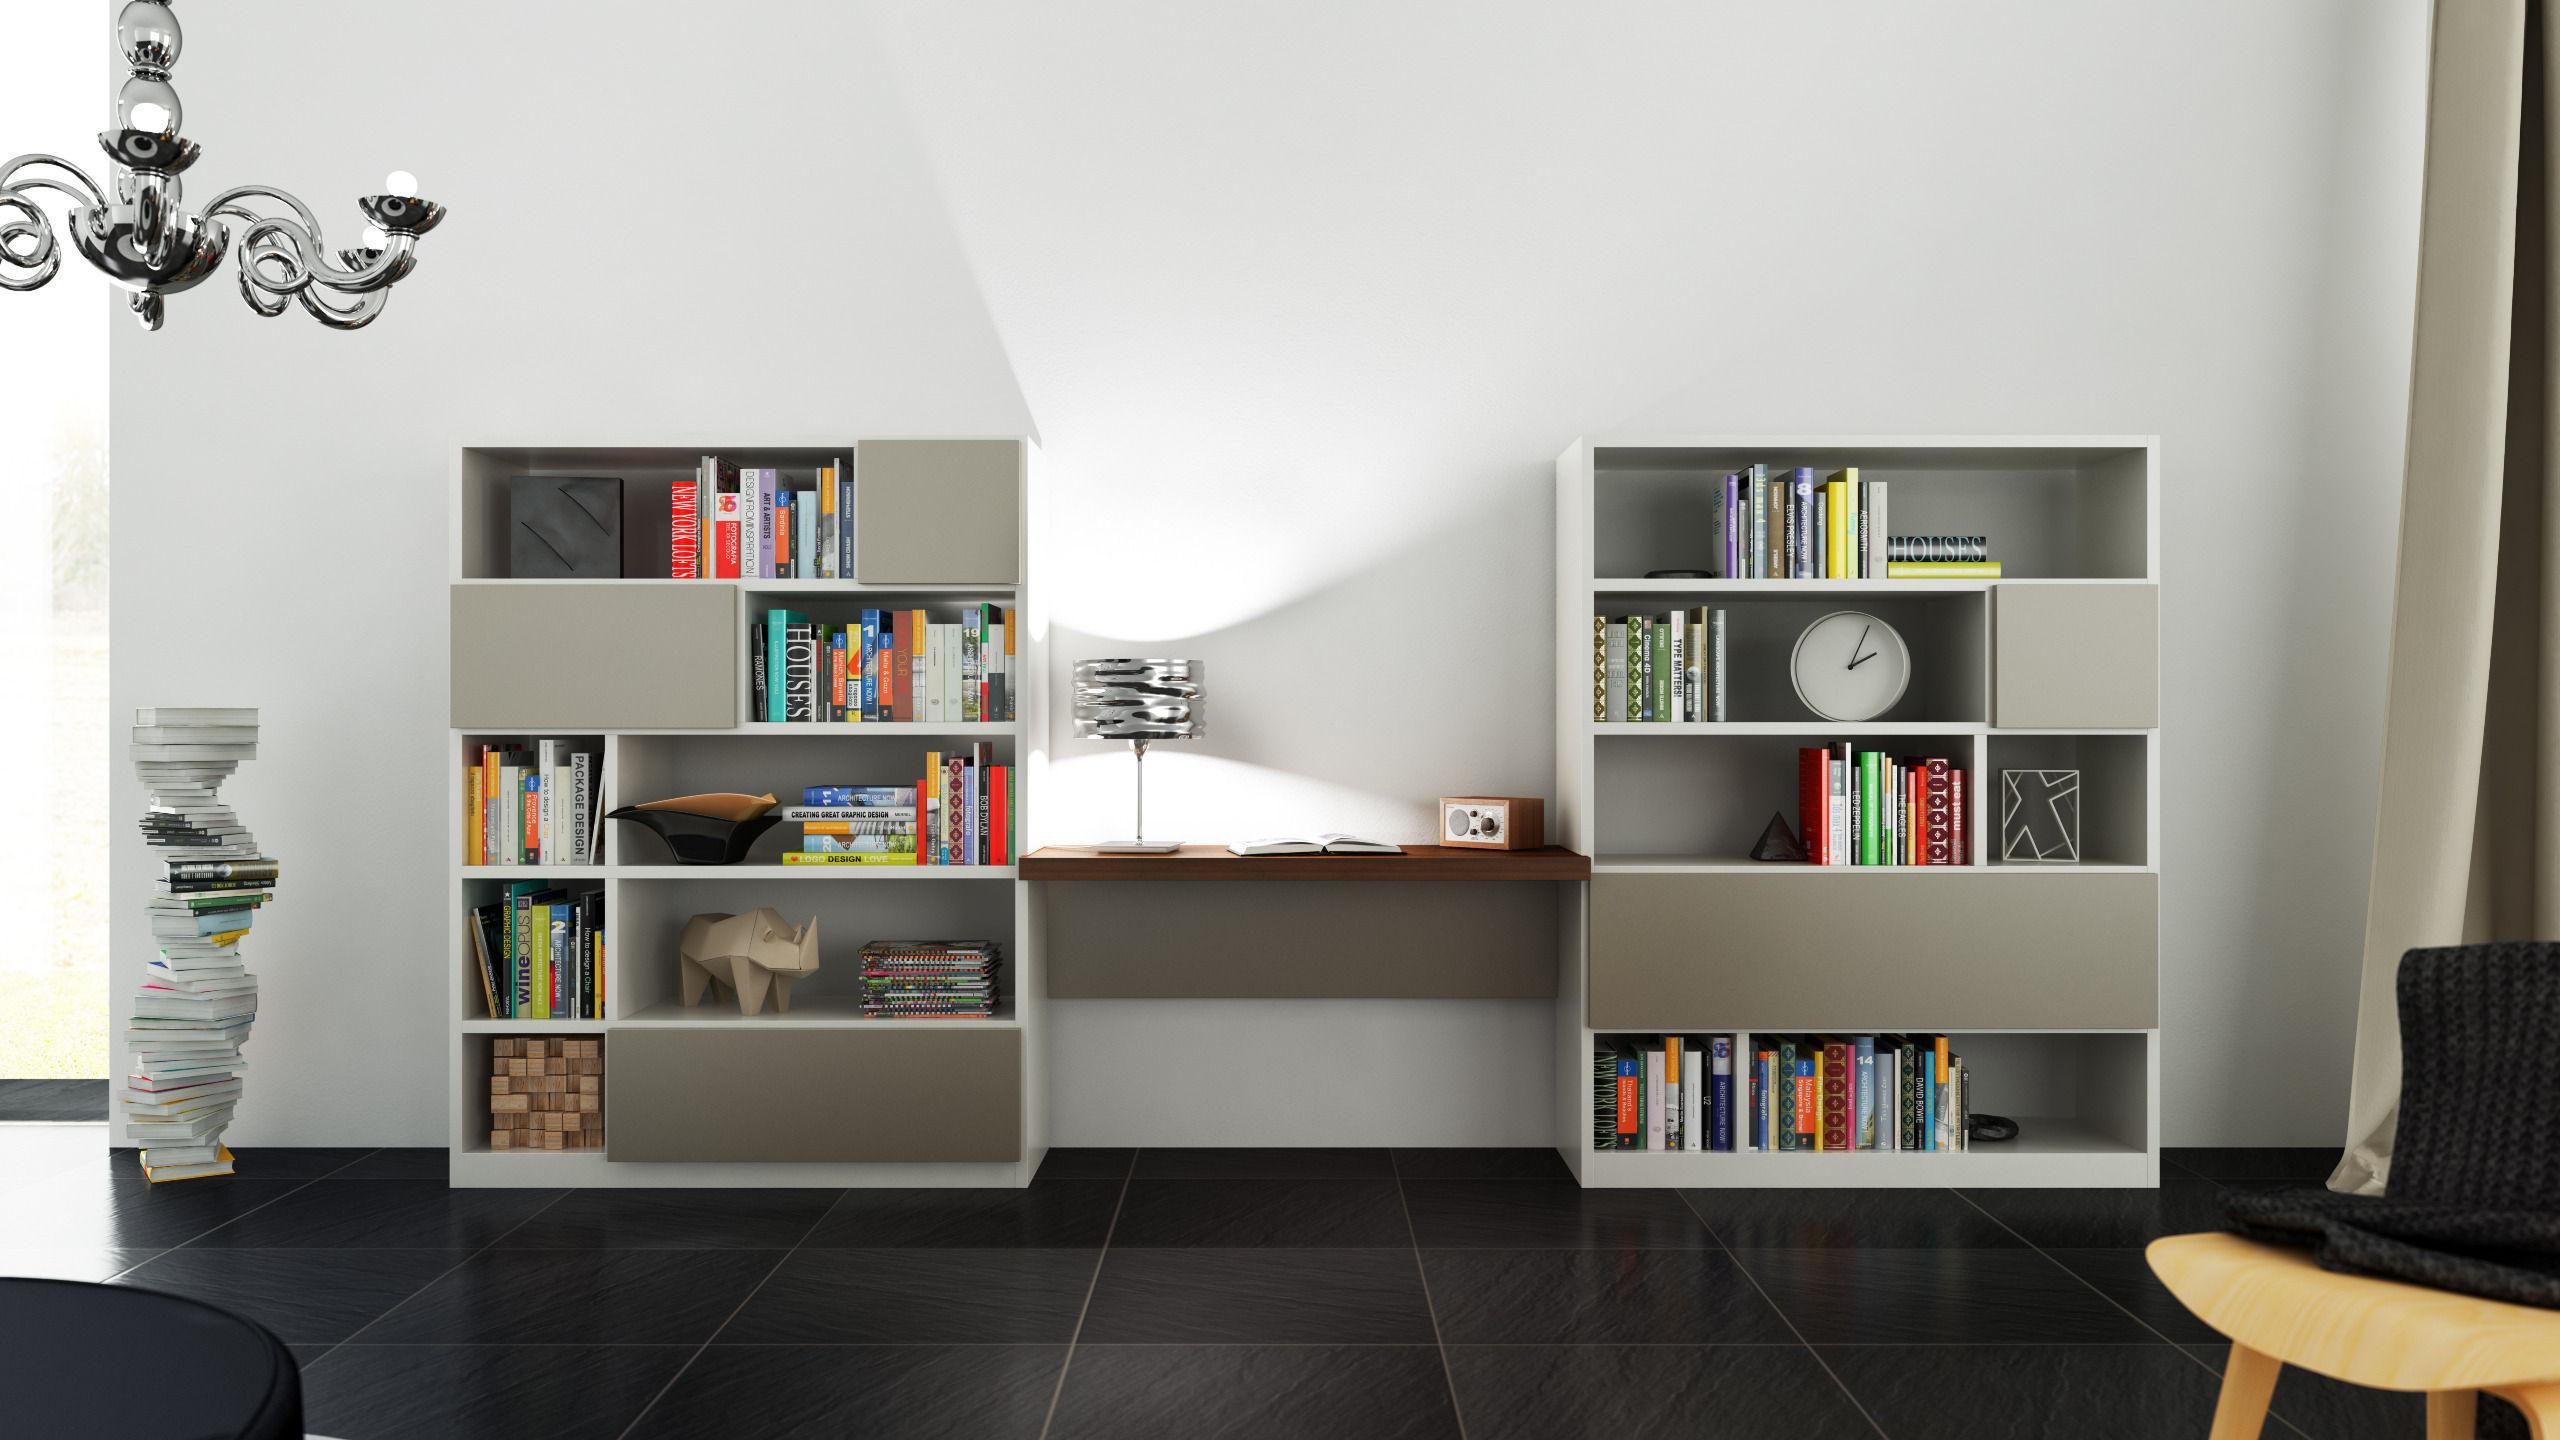 molteni 505 5 with books 3d model c4d. Black Bedroom Furniture Sets. Home Design Ideas